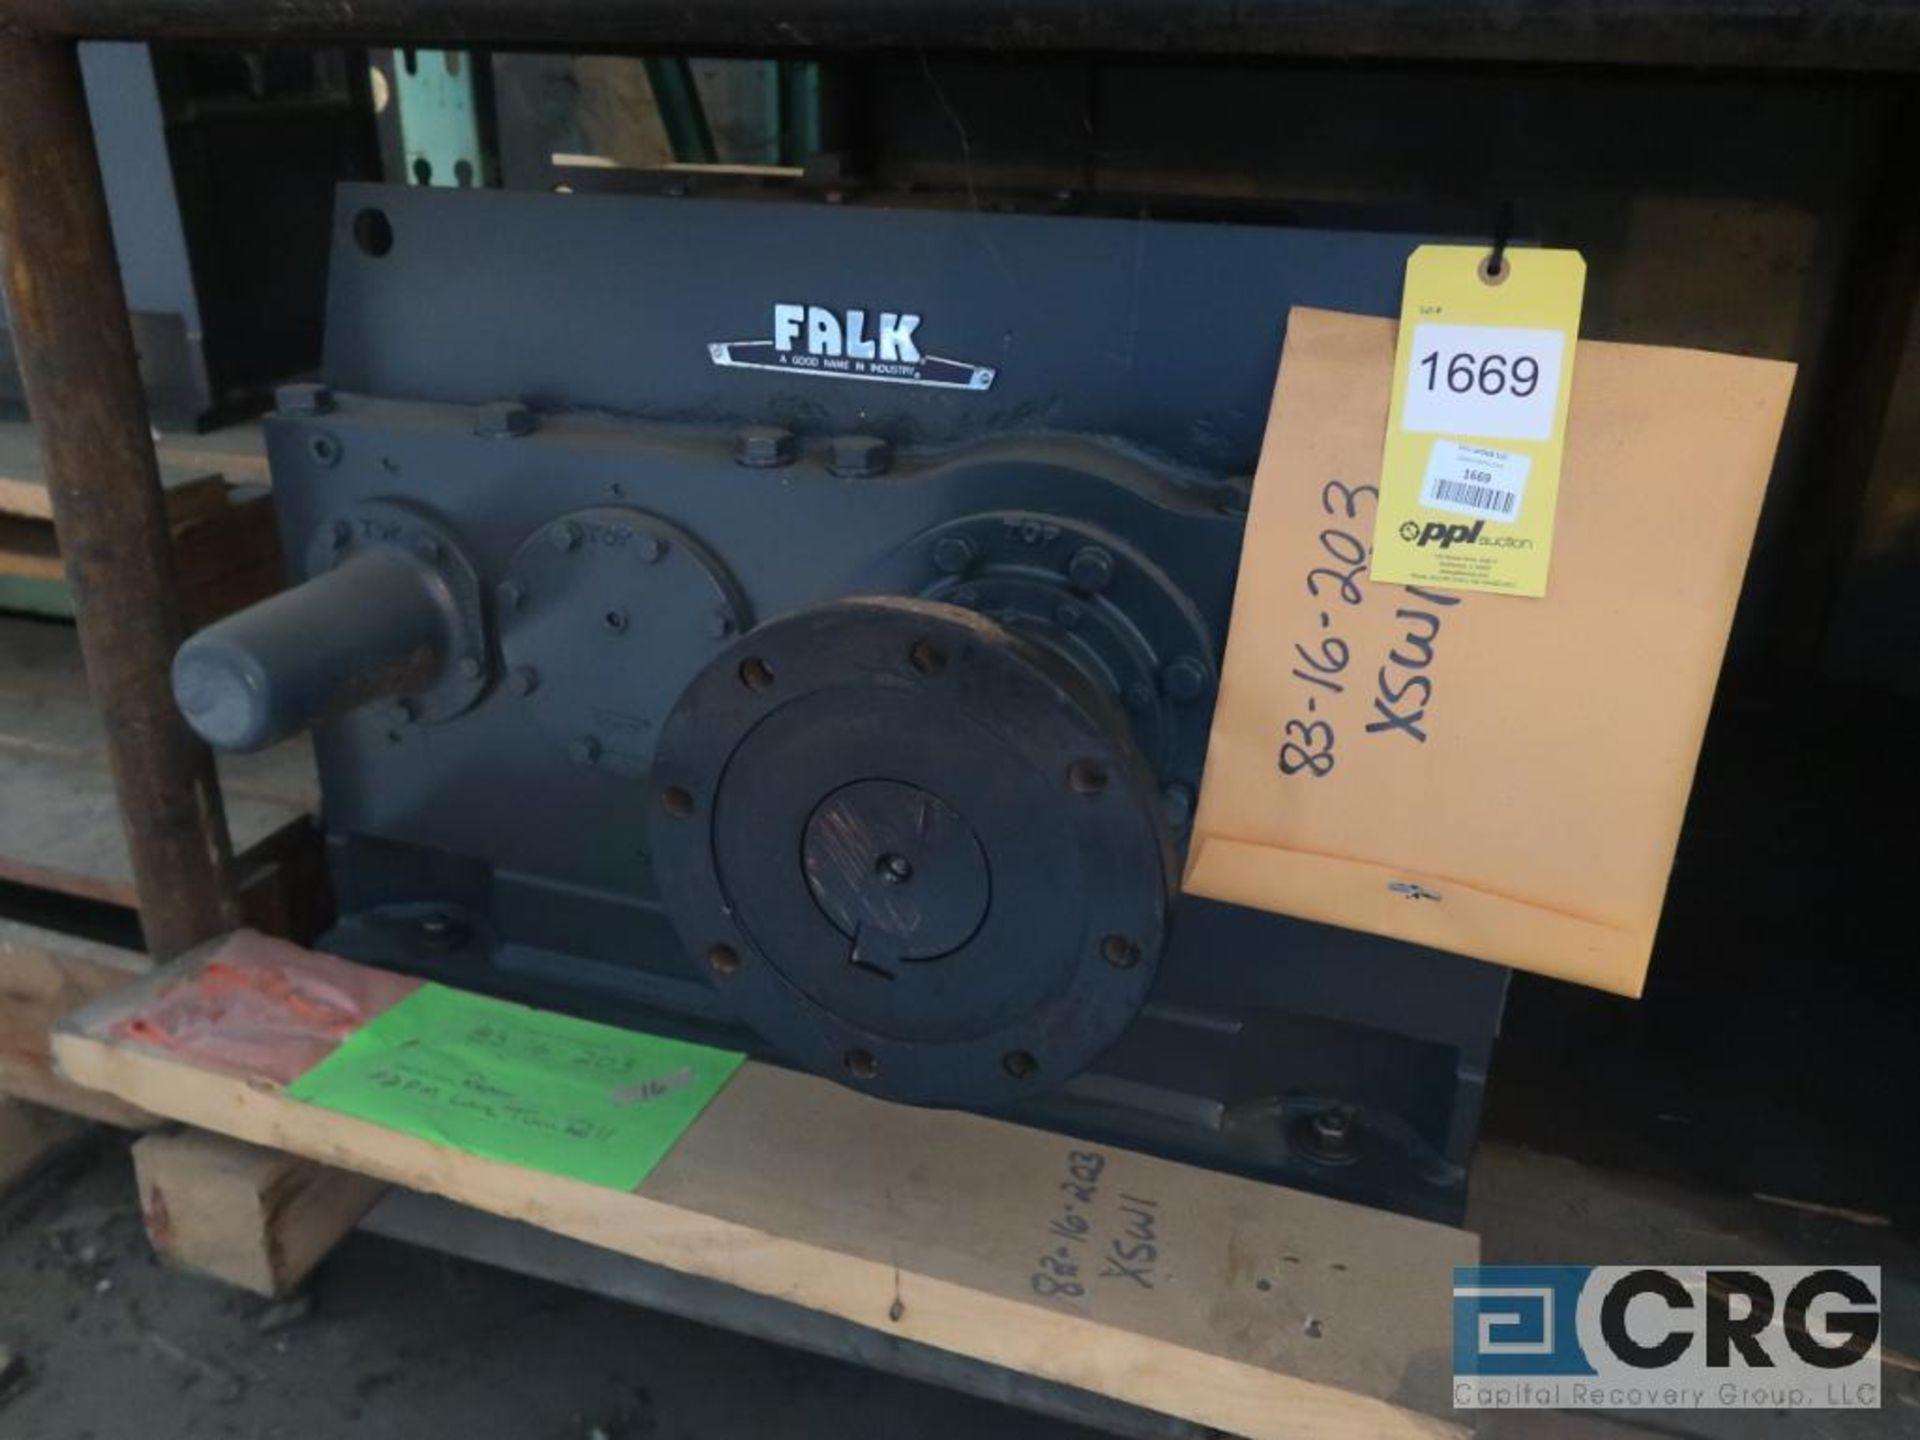 Falk 345 A3 gear drive, ratio-6.289, input RPM 1,750, output RPM 278.4, service rate HP. 125, s/n